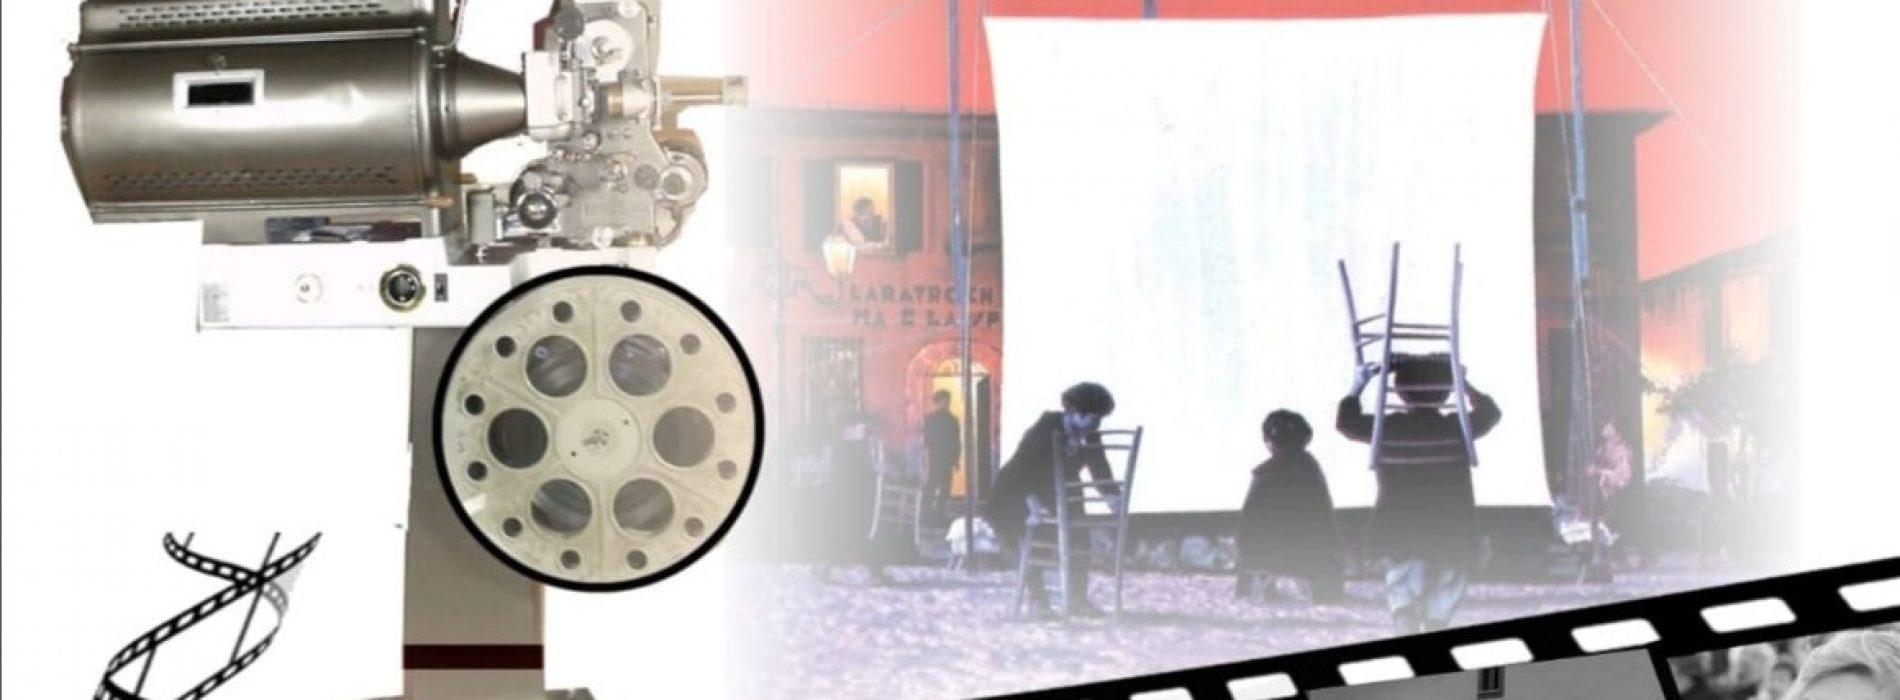 Luci di memoria, a Capua c'era una volta il cinema in pellicola